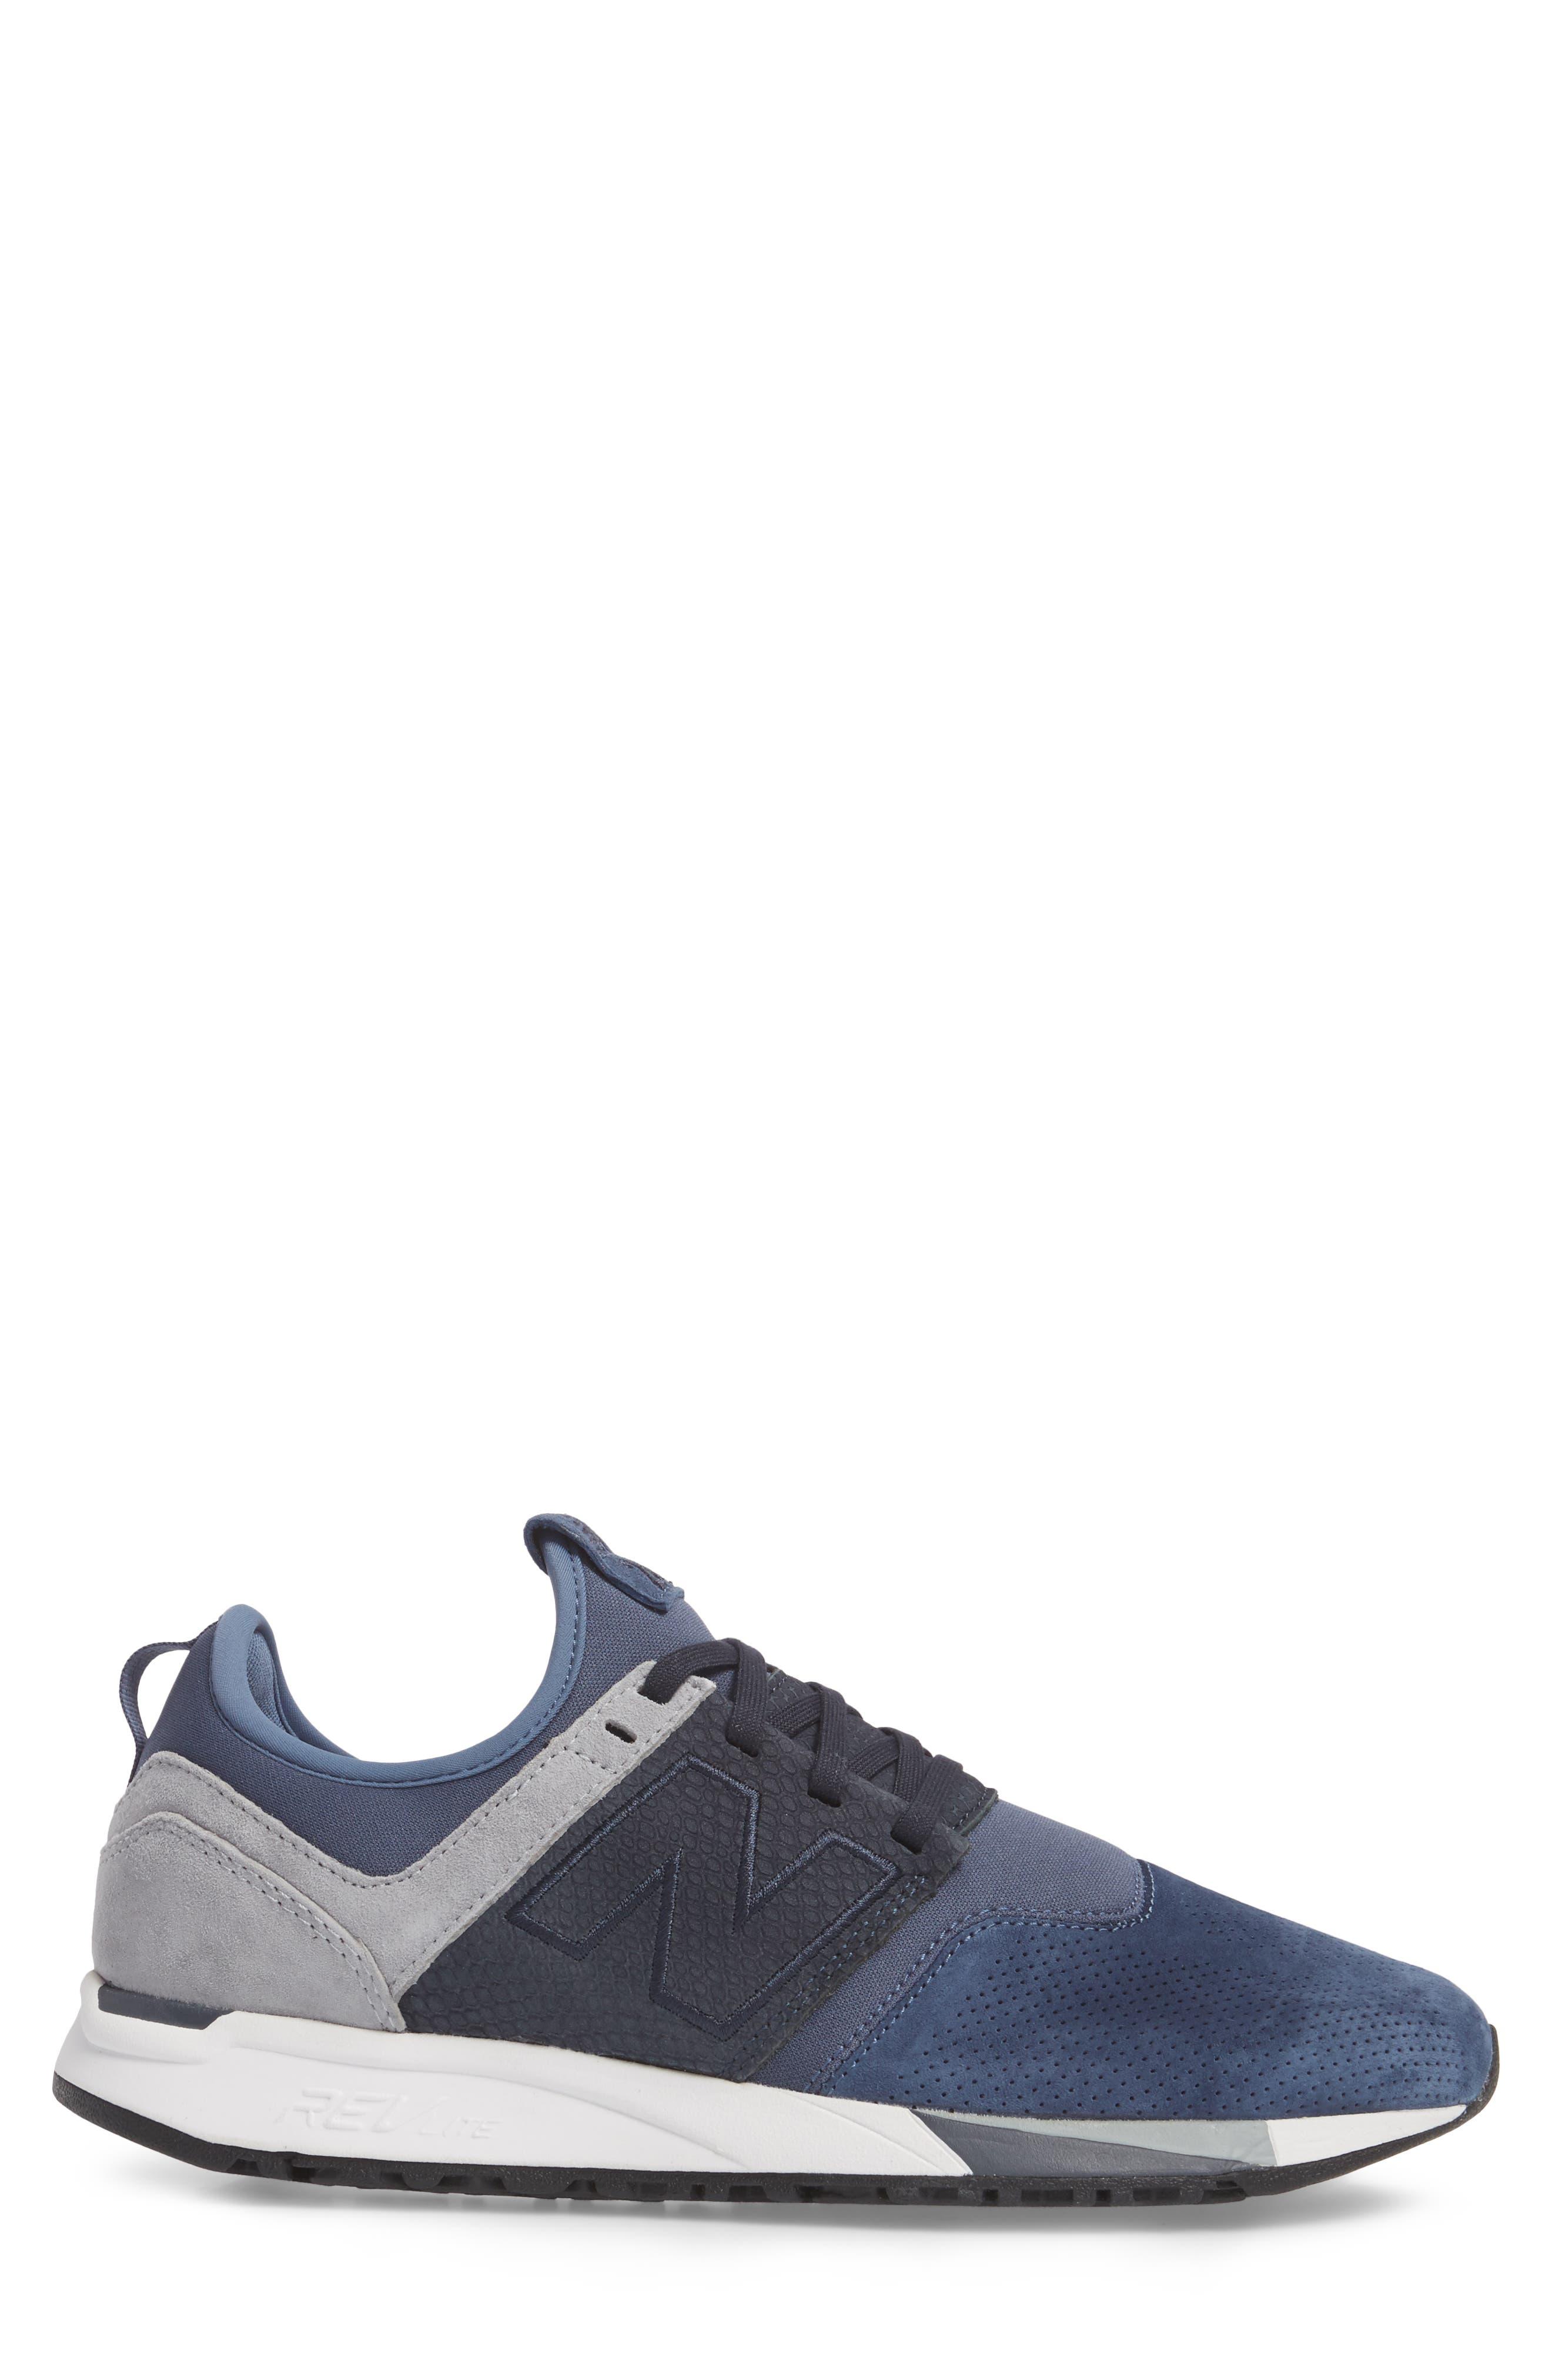 247 Luxe Sneaker,                             Alternate thumbnail 3, color,                             Blue